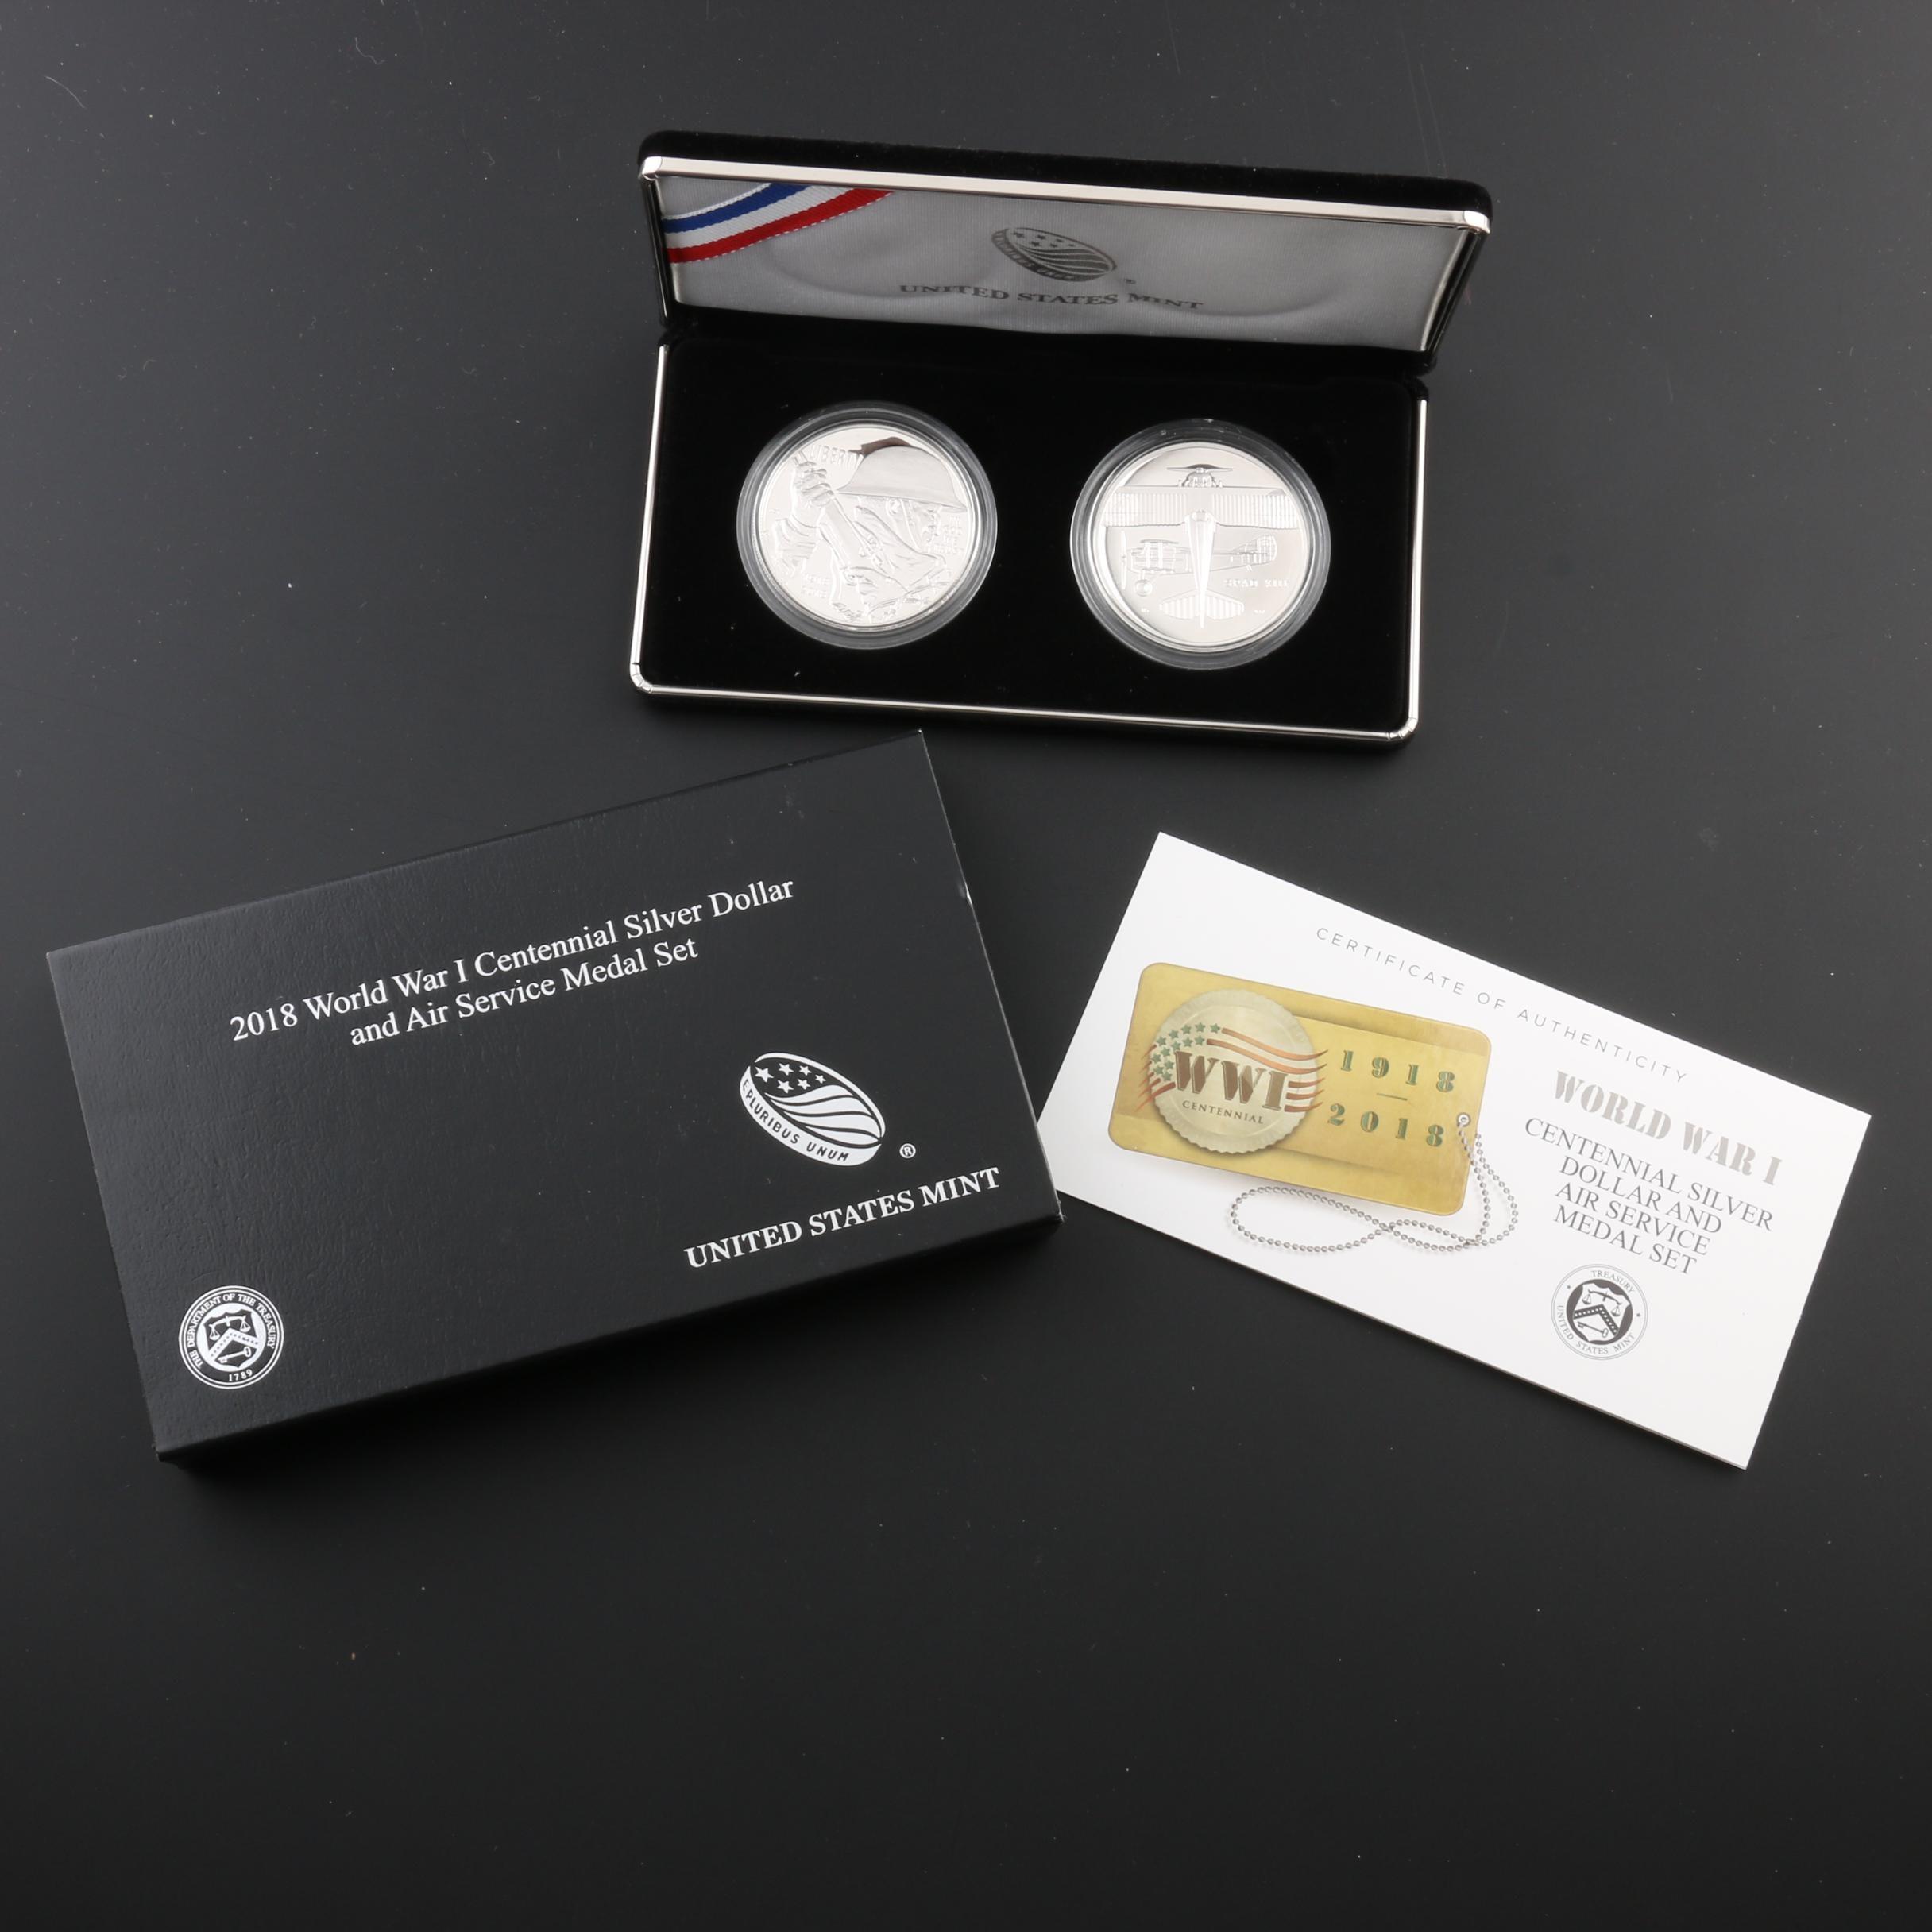 2018 World War I Centennial Silver Dollar and Air Service Medal Proof Set